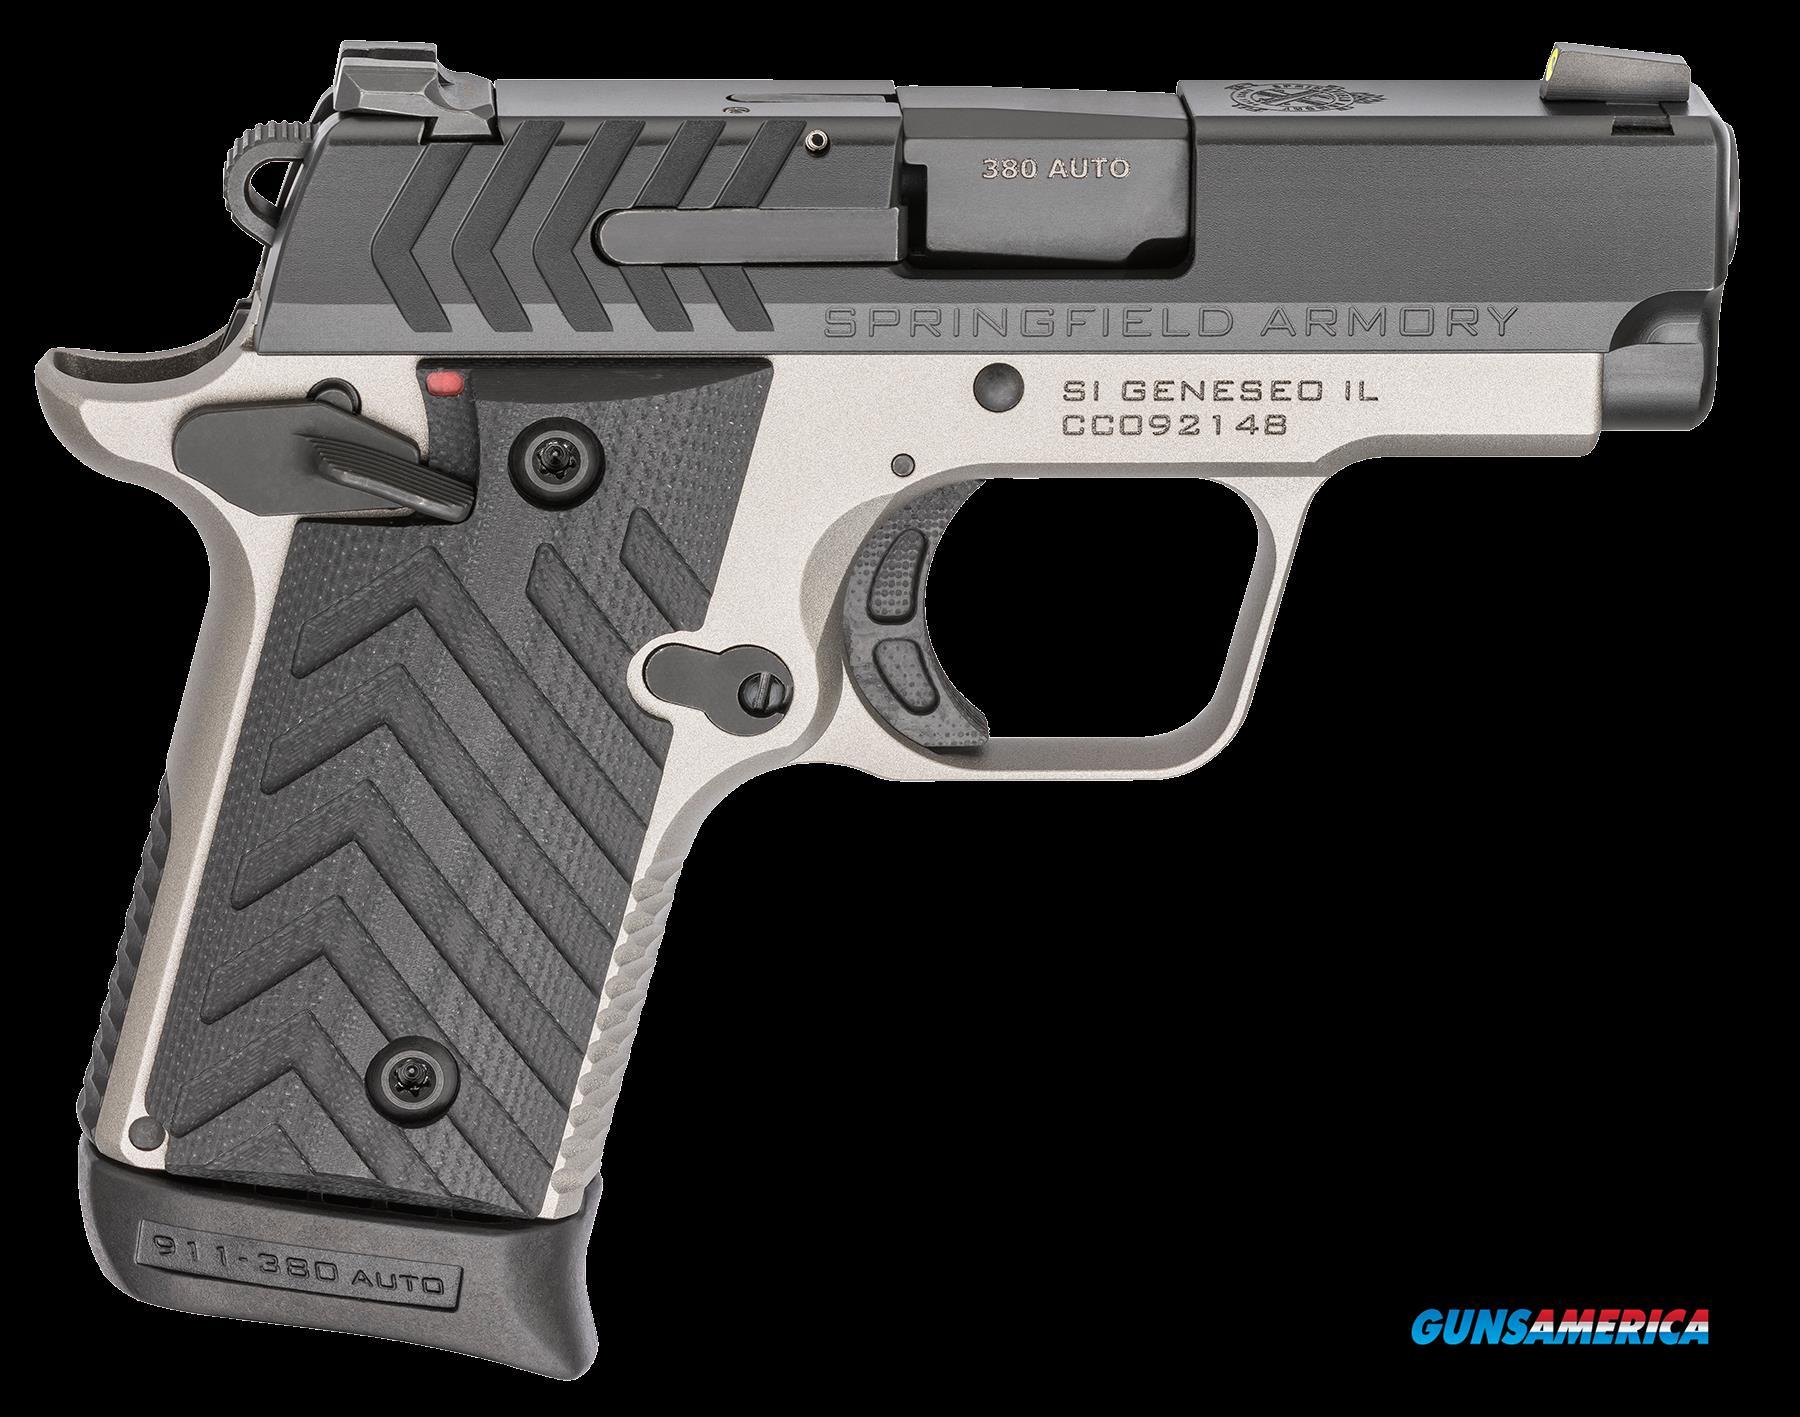 Springfield Armory 911, Spg Pg9109tn      380 911 2.7 Titanium-ntrd  6-7r  Guns > Pistols > 1911 Pistol Copies (non-Colt)